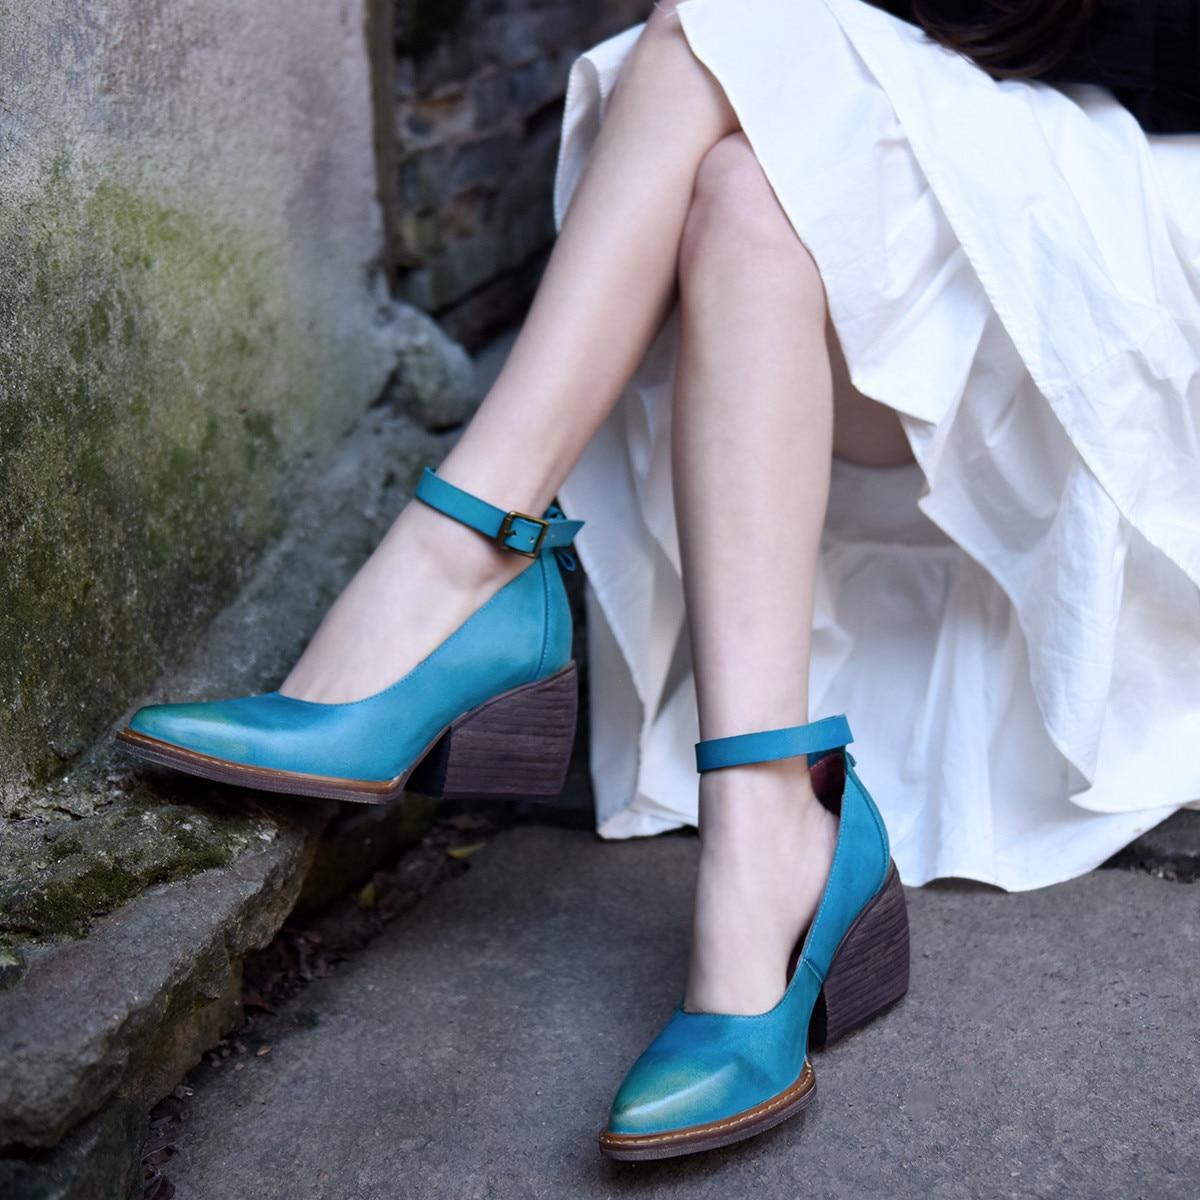 Artmu Origional Retro High Heels Women's Shoes Chunky-Heel Buckle Shallow Mouth Handmade Shoes Genuine Leather Pointed Toe Shoes